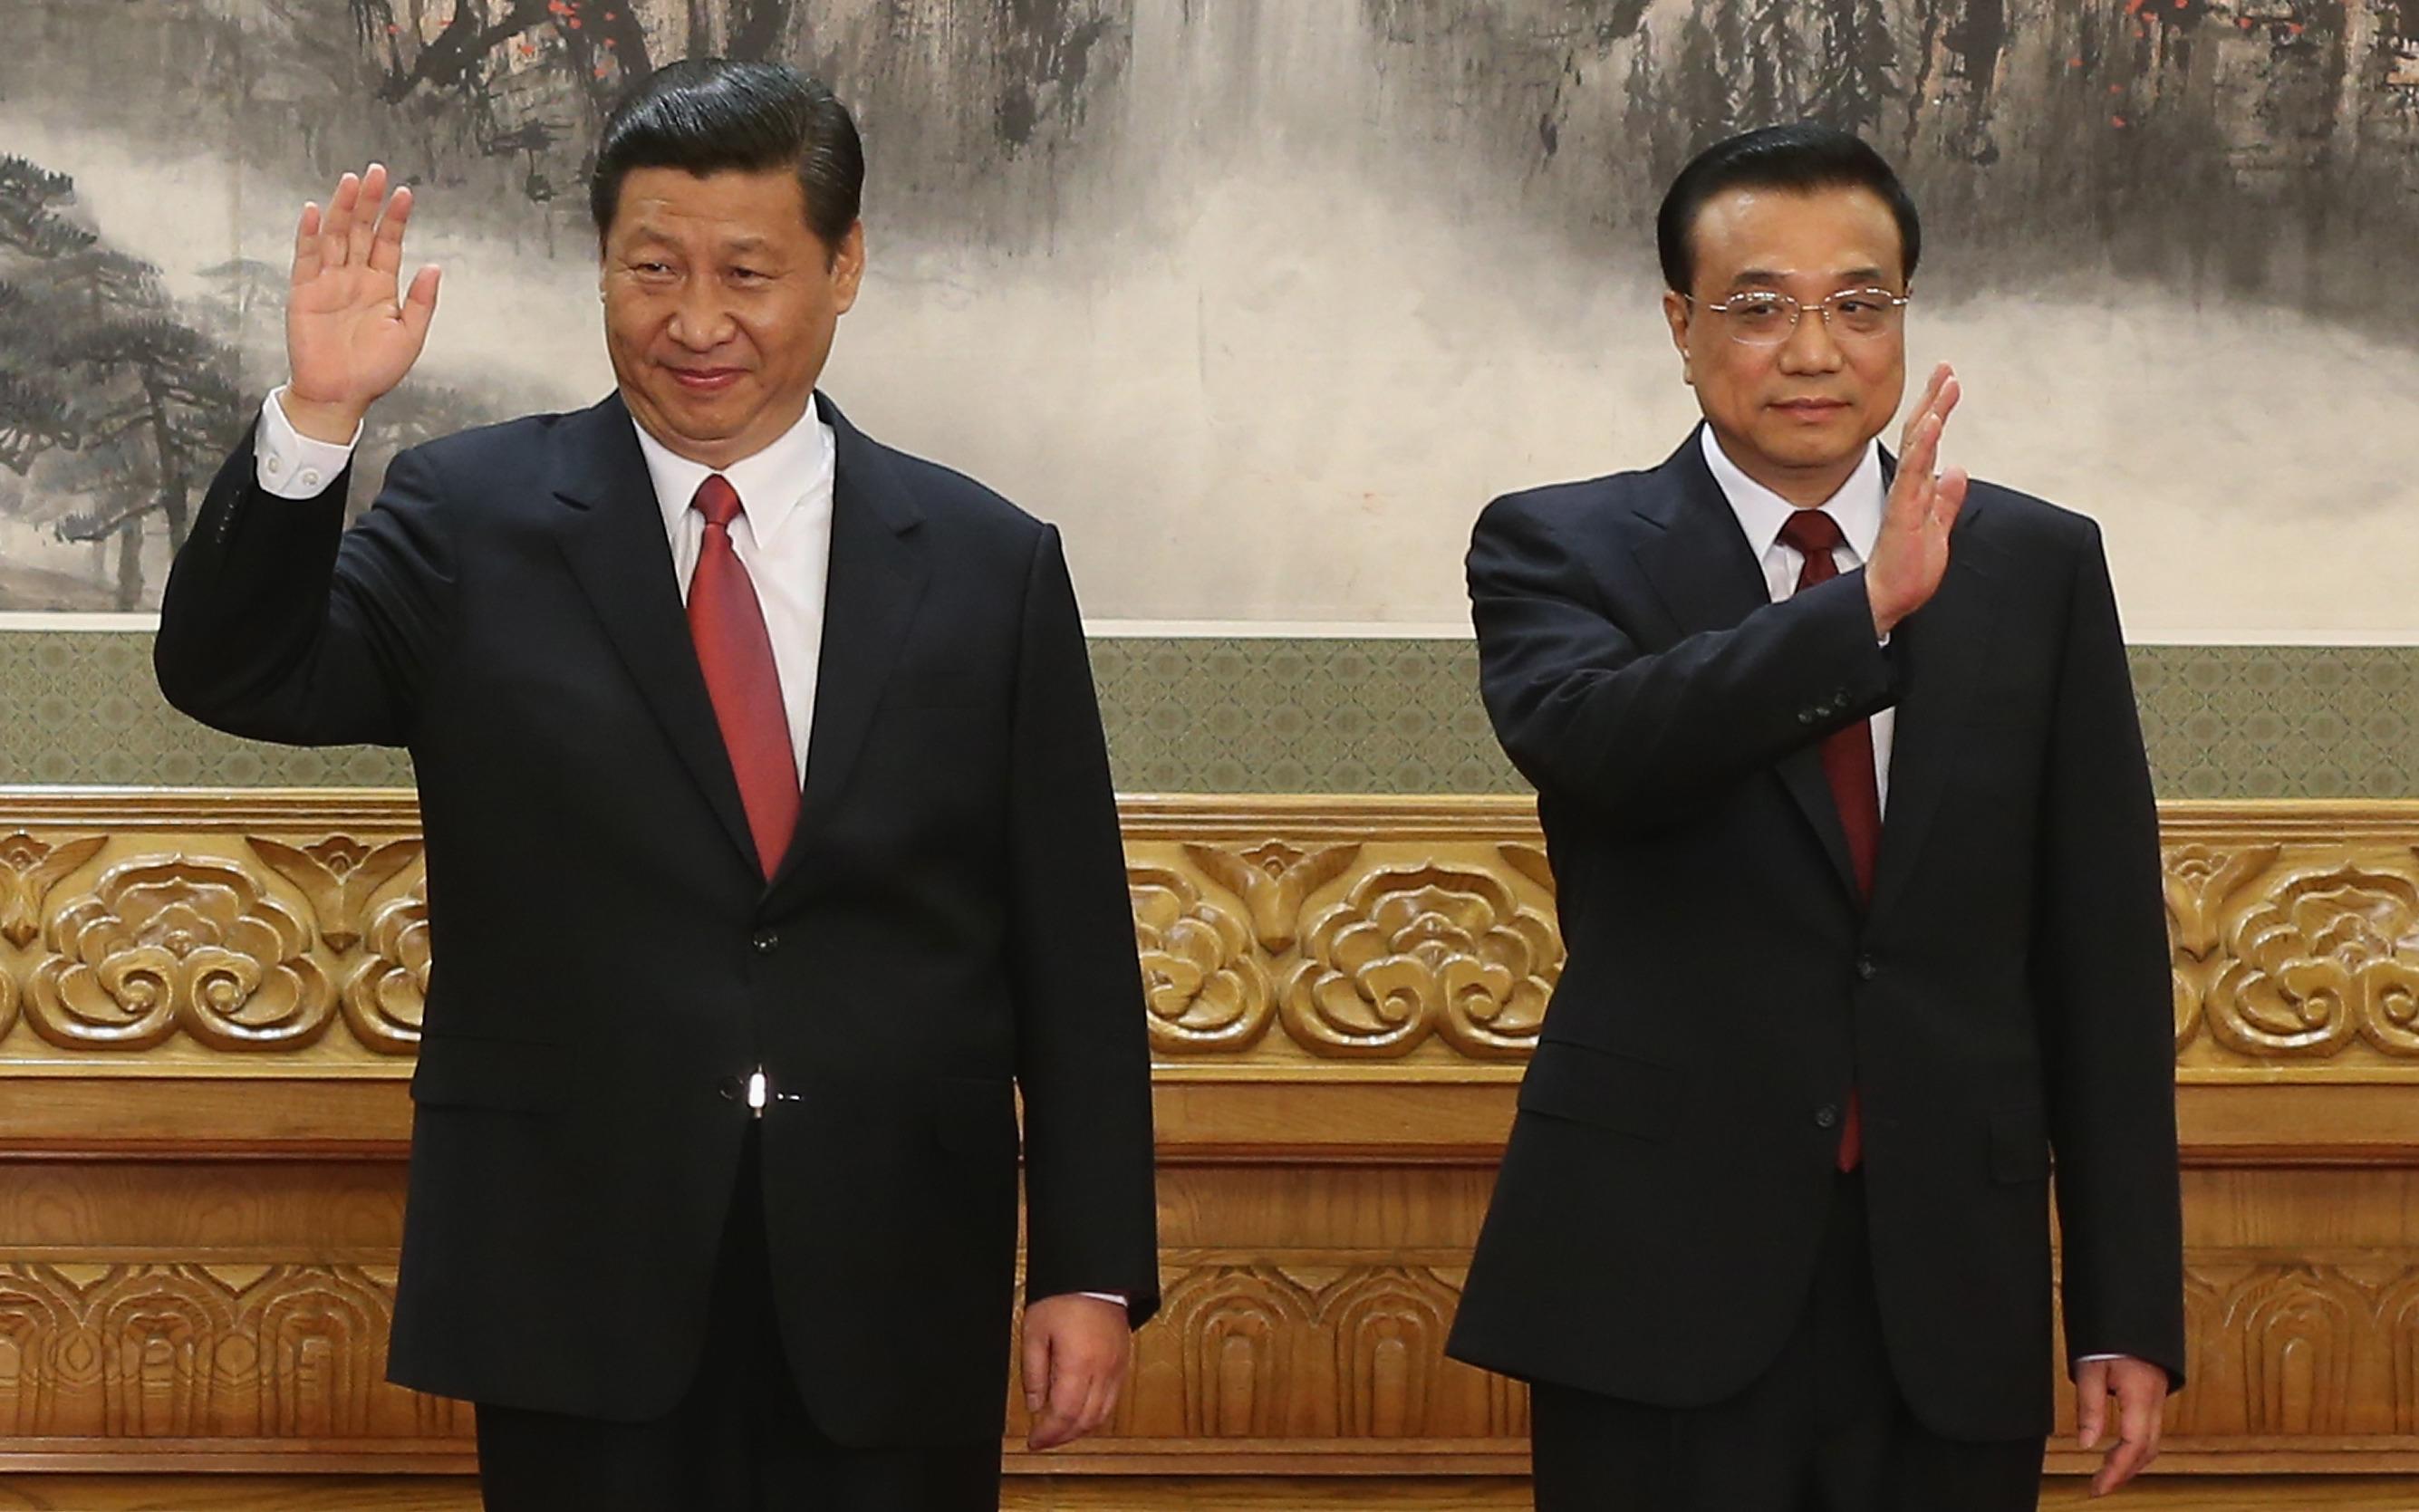 EU-China-Videokonferenz: EU-Spitzen konferieren mit Chinas Regierungschef Li Keqiang